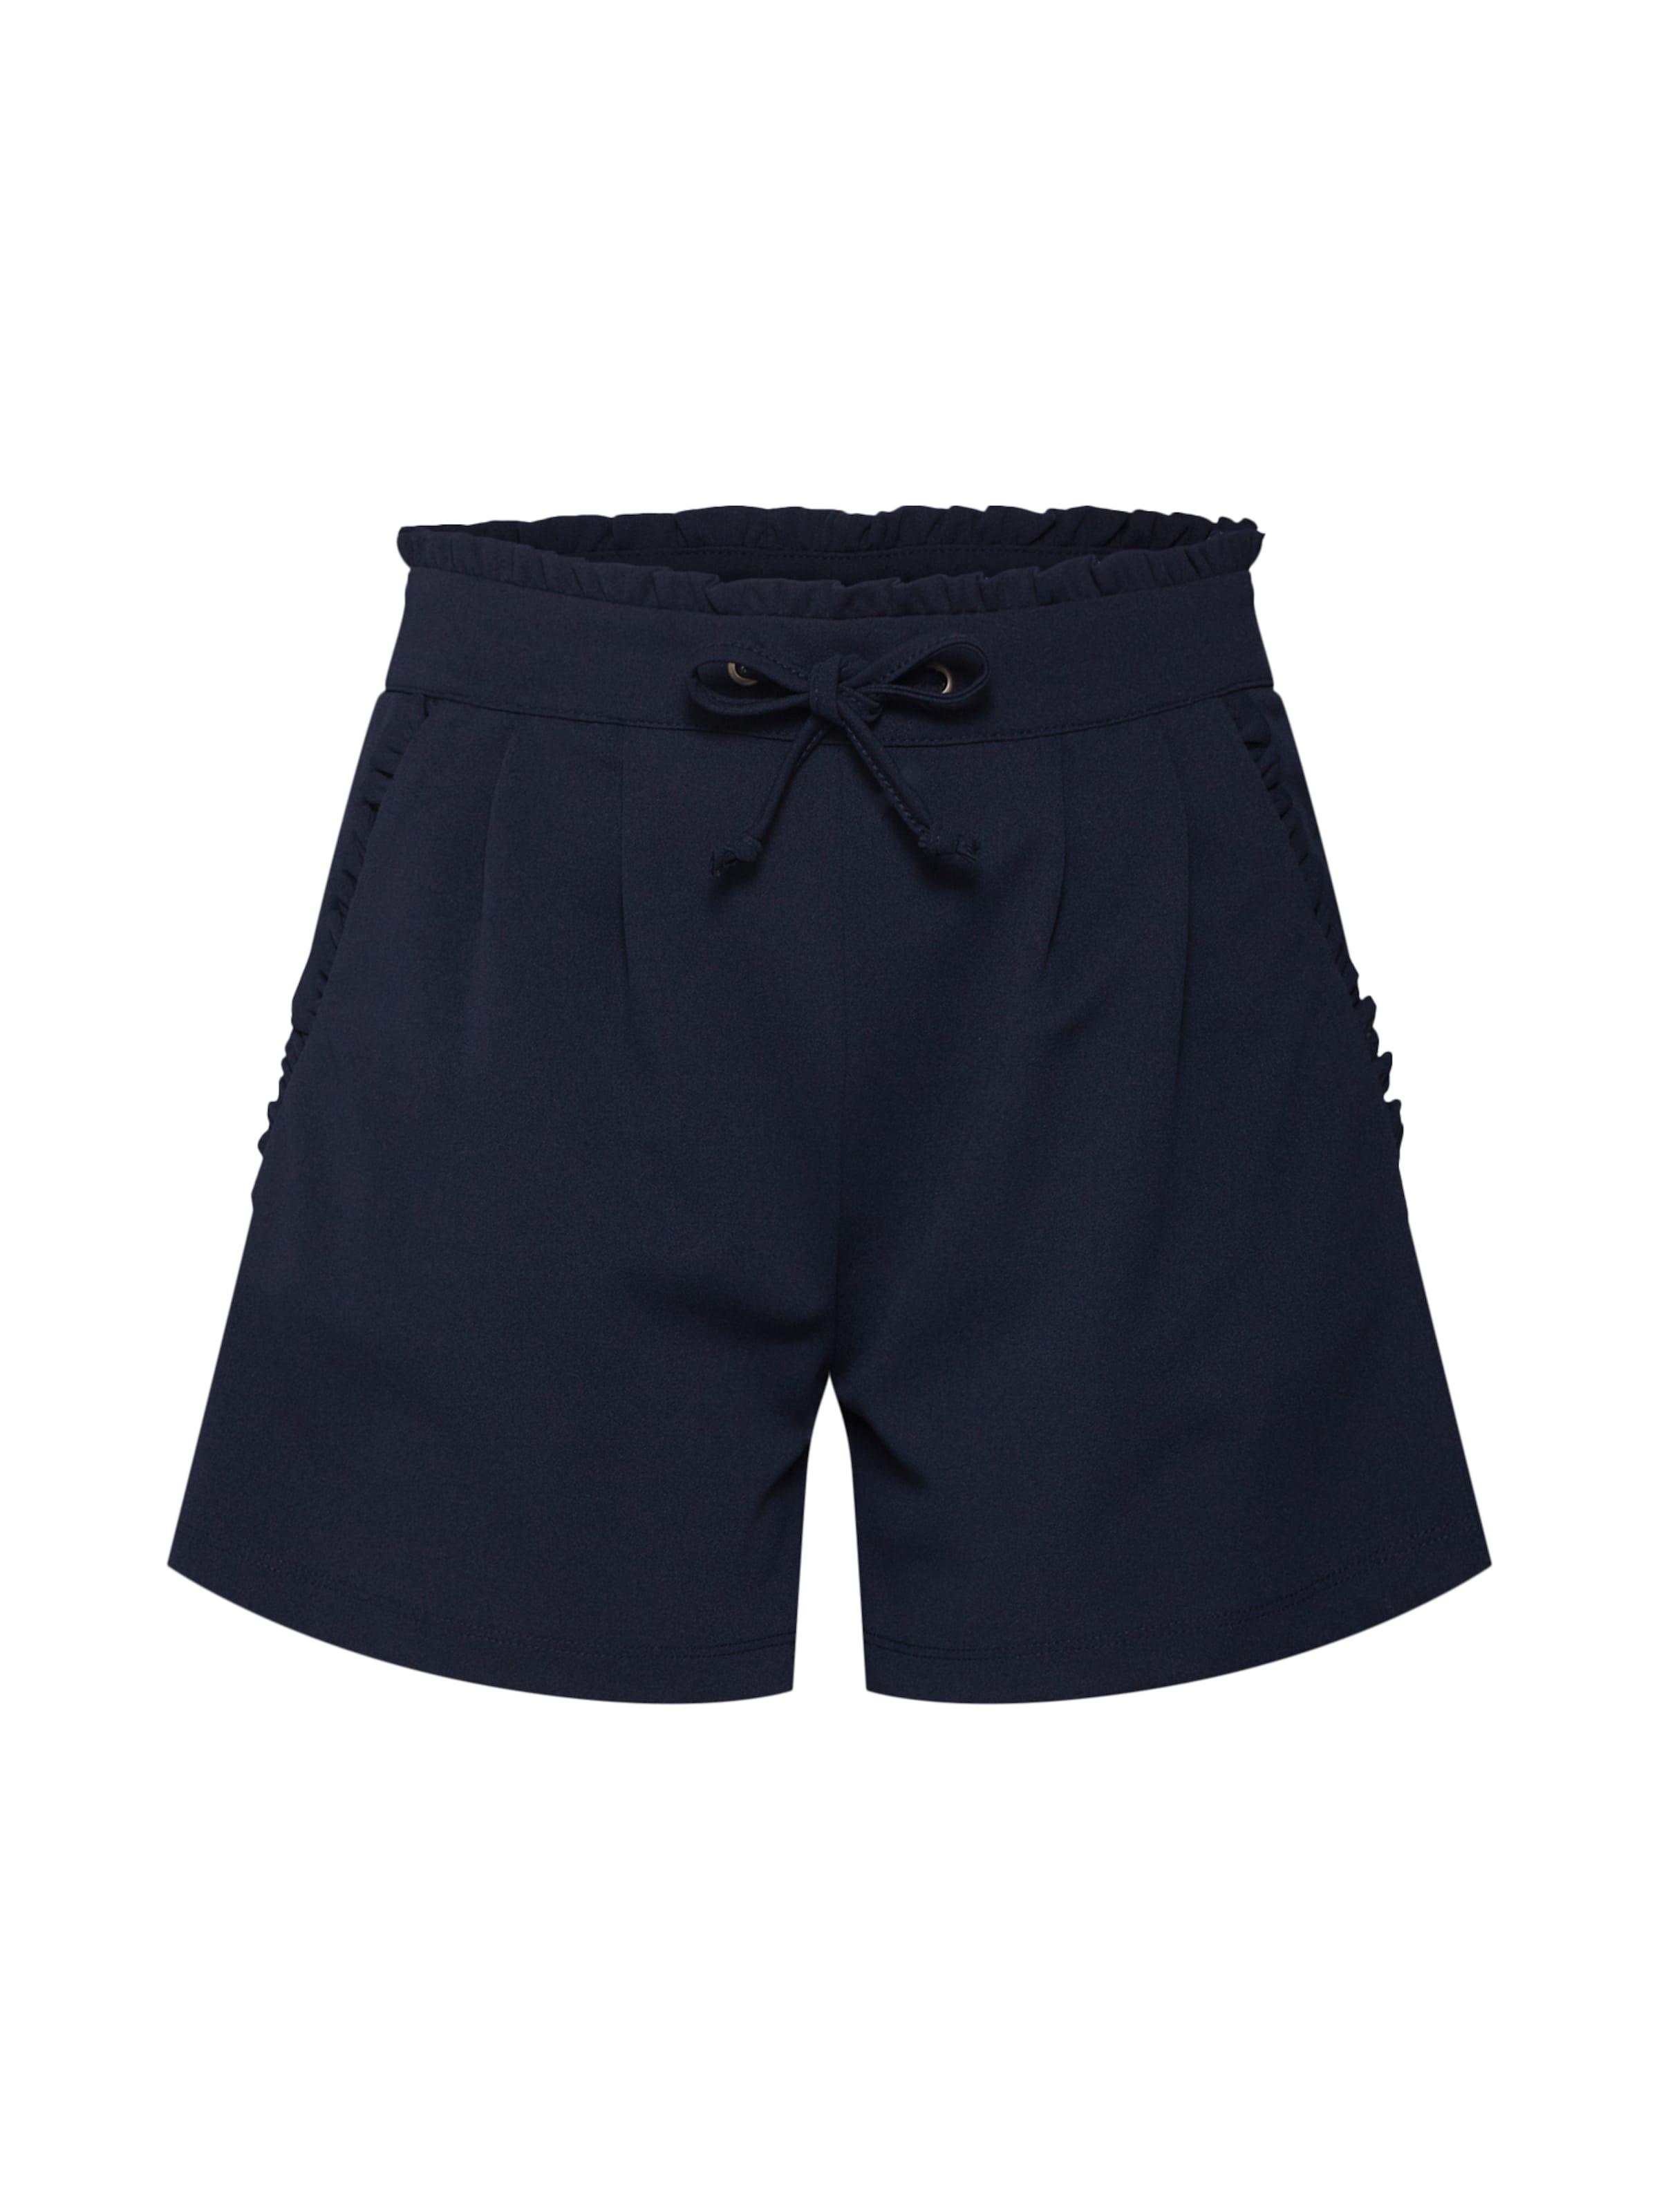 En De Yong Jacqueline 'catia' Bleu Pantalon qSUzVMp